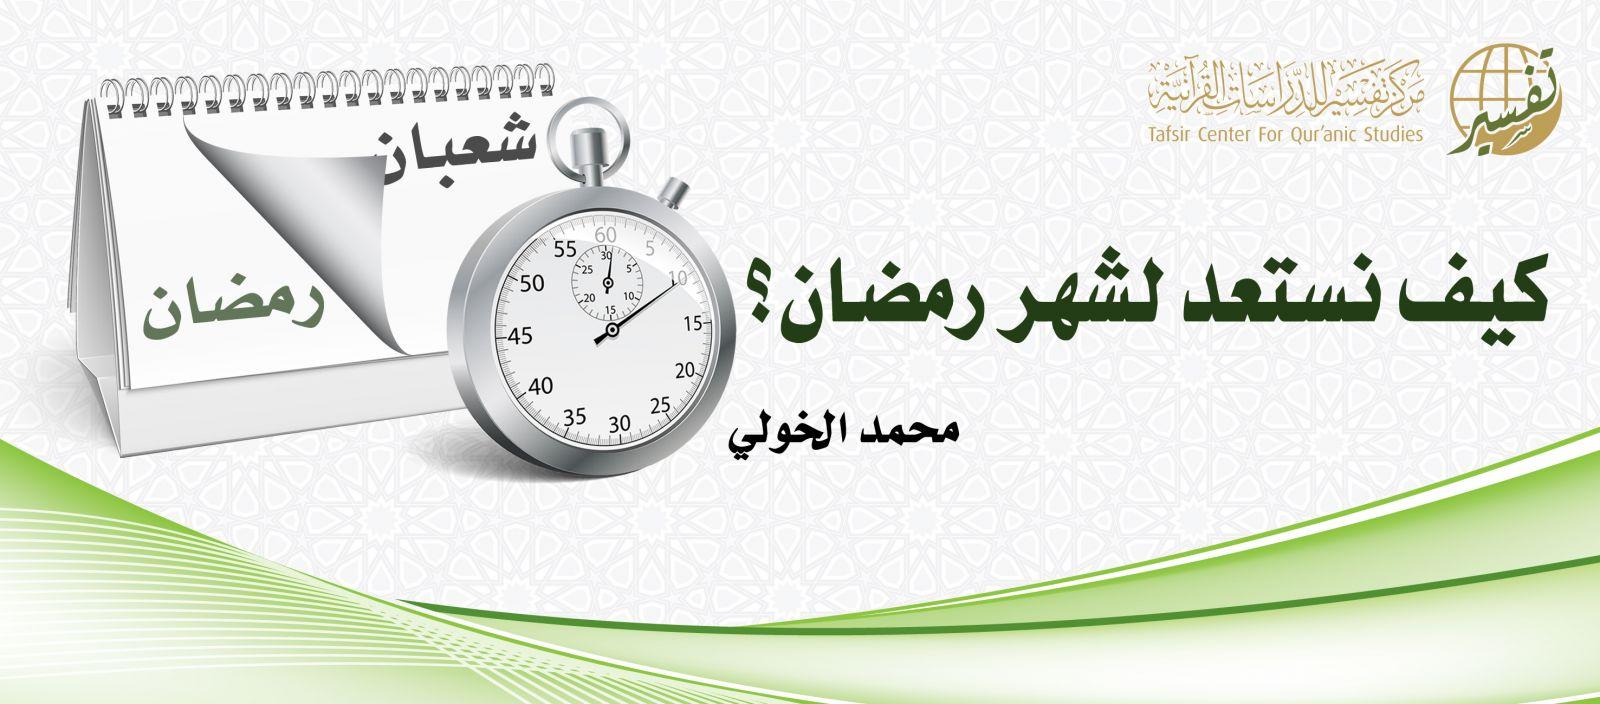 كيف نستعد لشهر رمضان؟